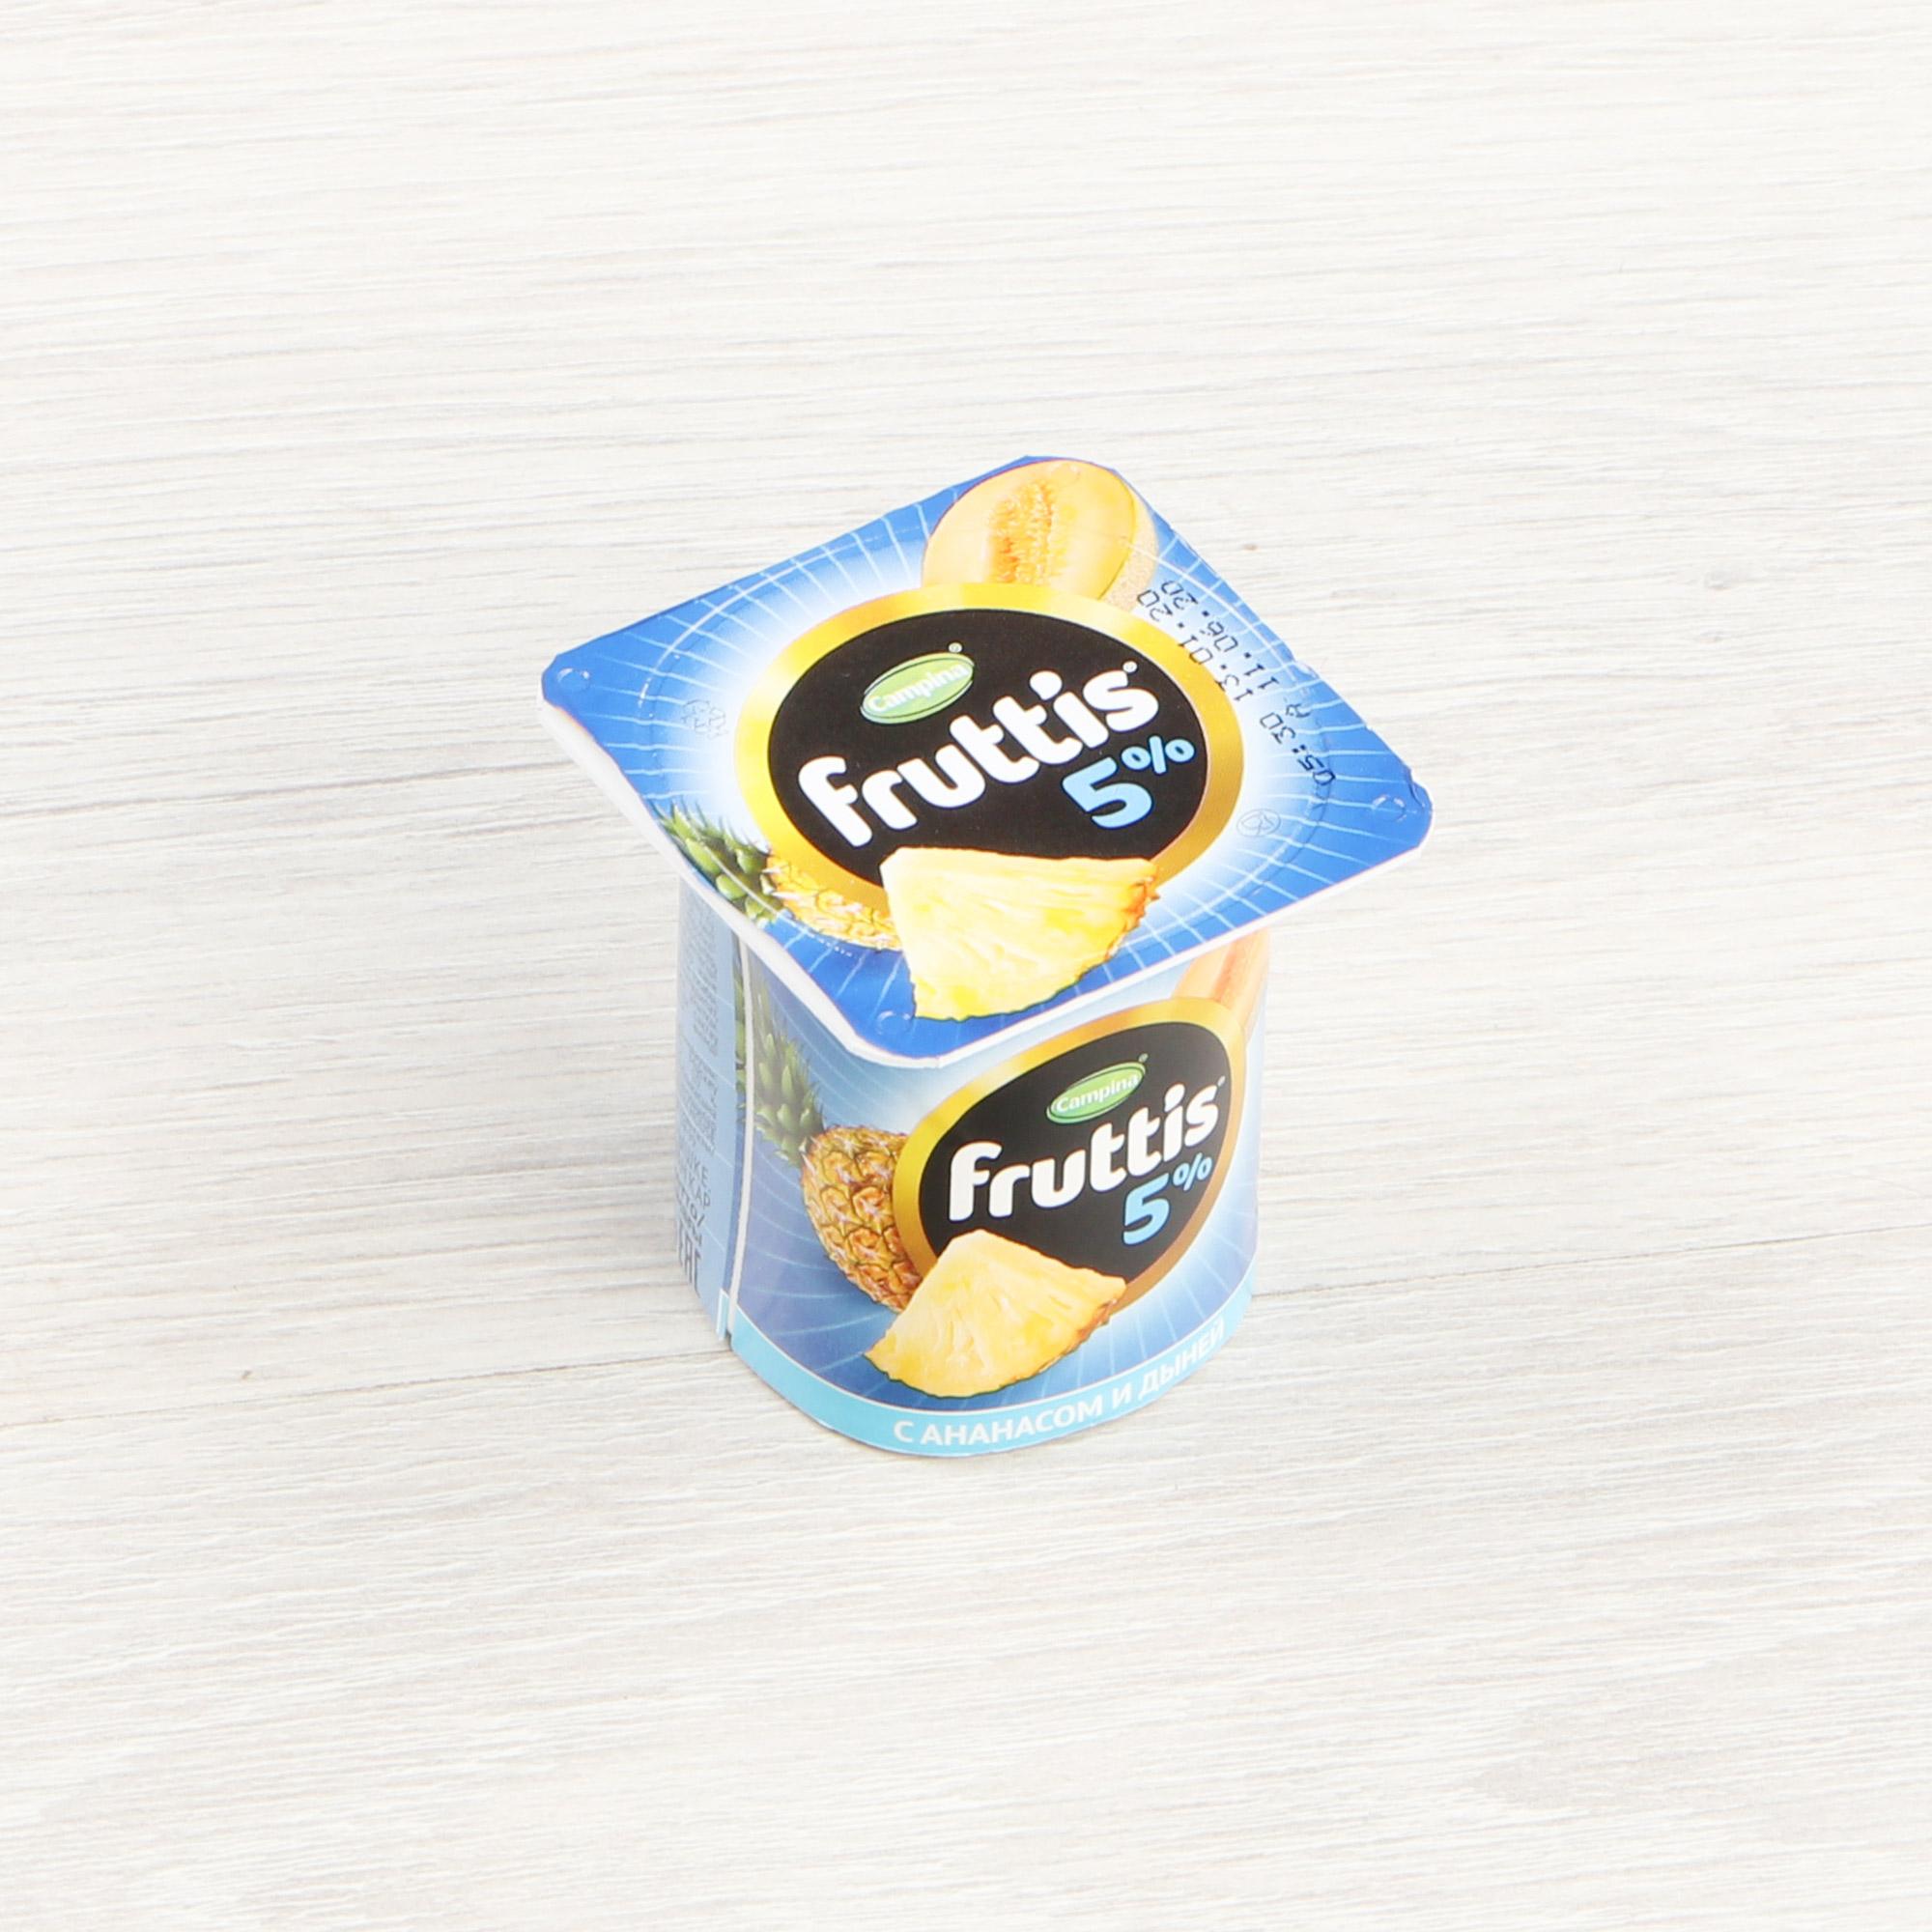 Фото - Йогурт Campina Fruttis Ананас, дыня 5% 115 г йогурт campina fruttis легкий клубника 0 1% 110 г